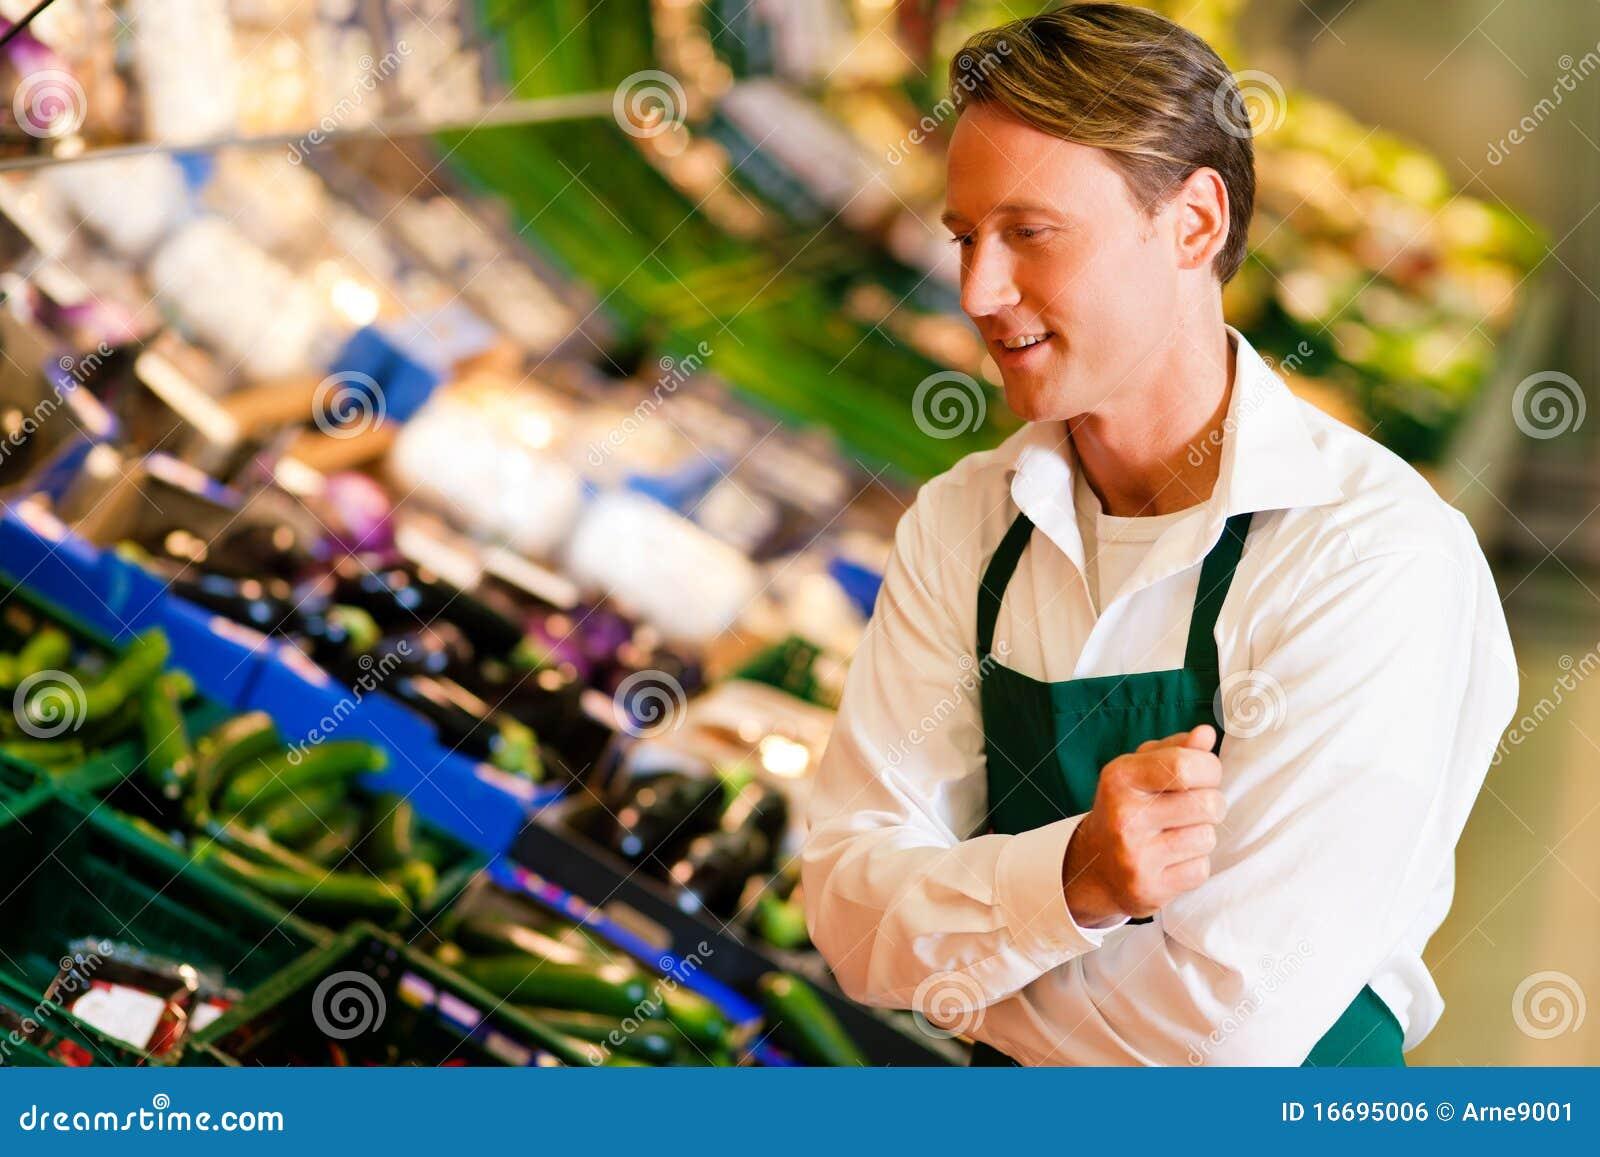 Som assistentmannen shoppar supermarketen